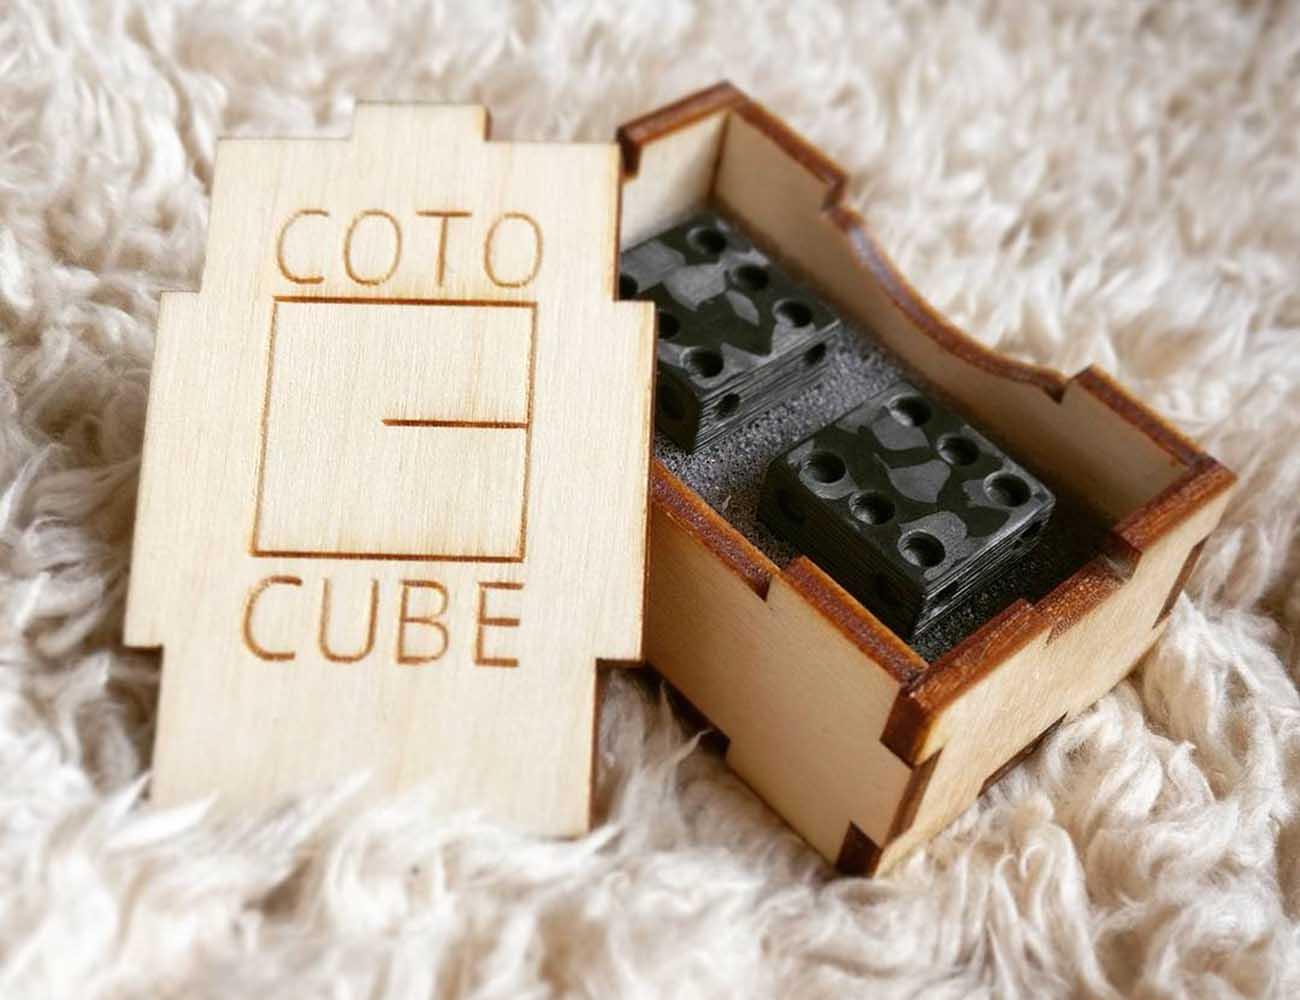 Cotocube – Solid Carbon Fiber Dice